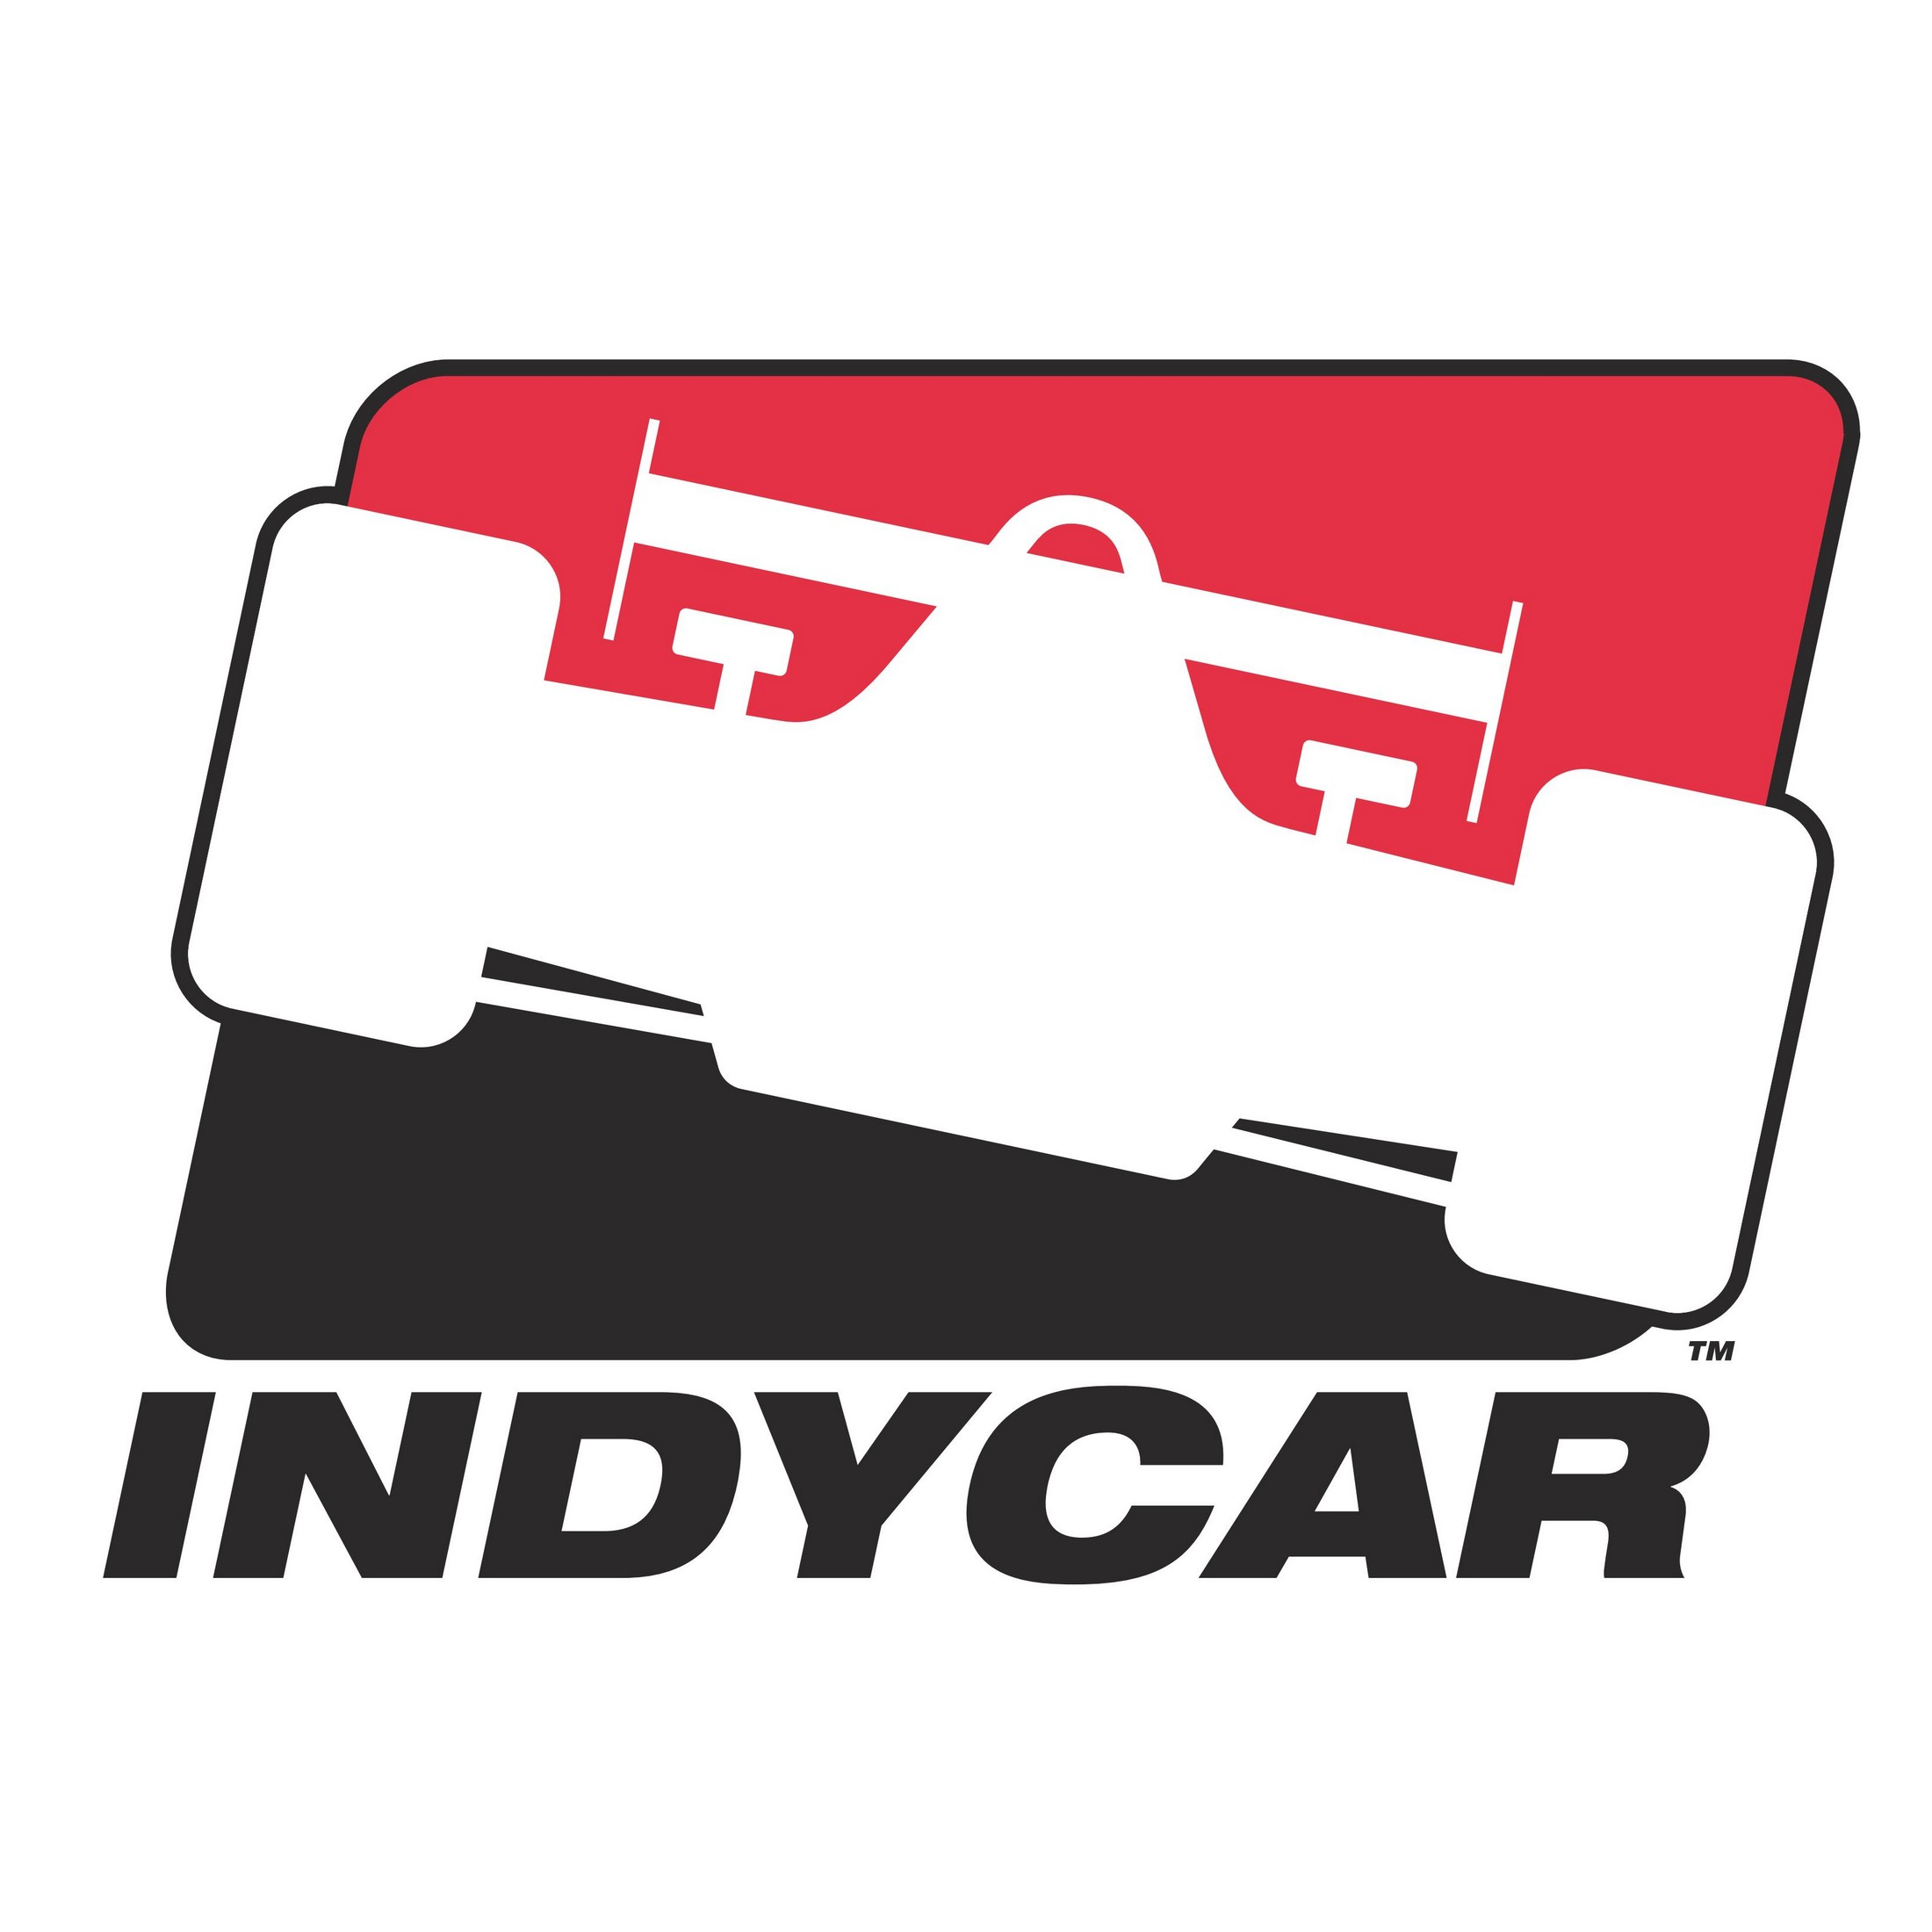 2015 IndyCar - Indy 500